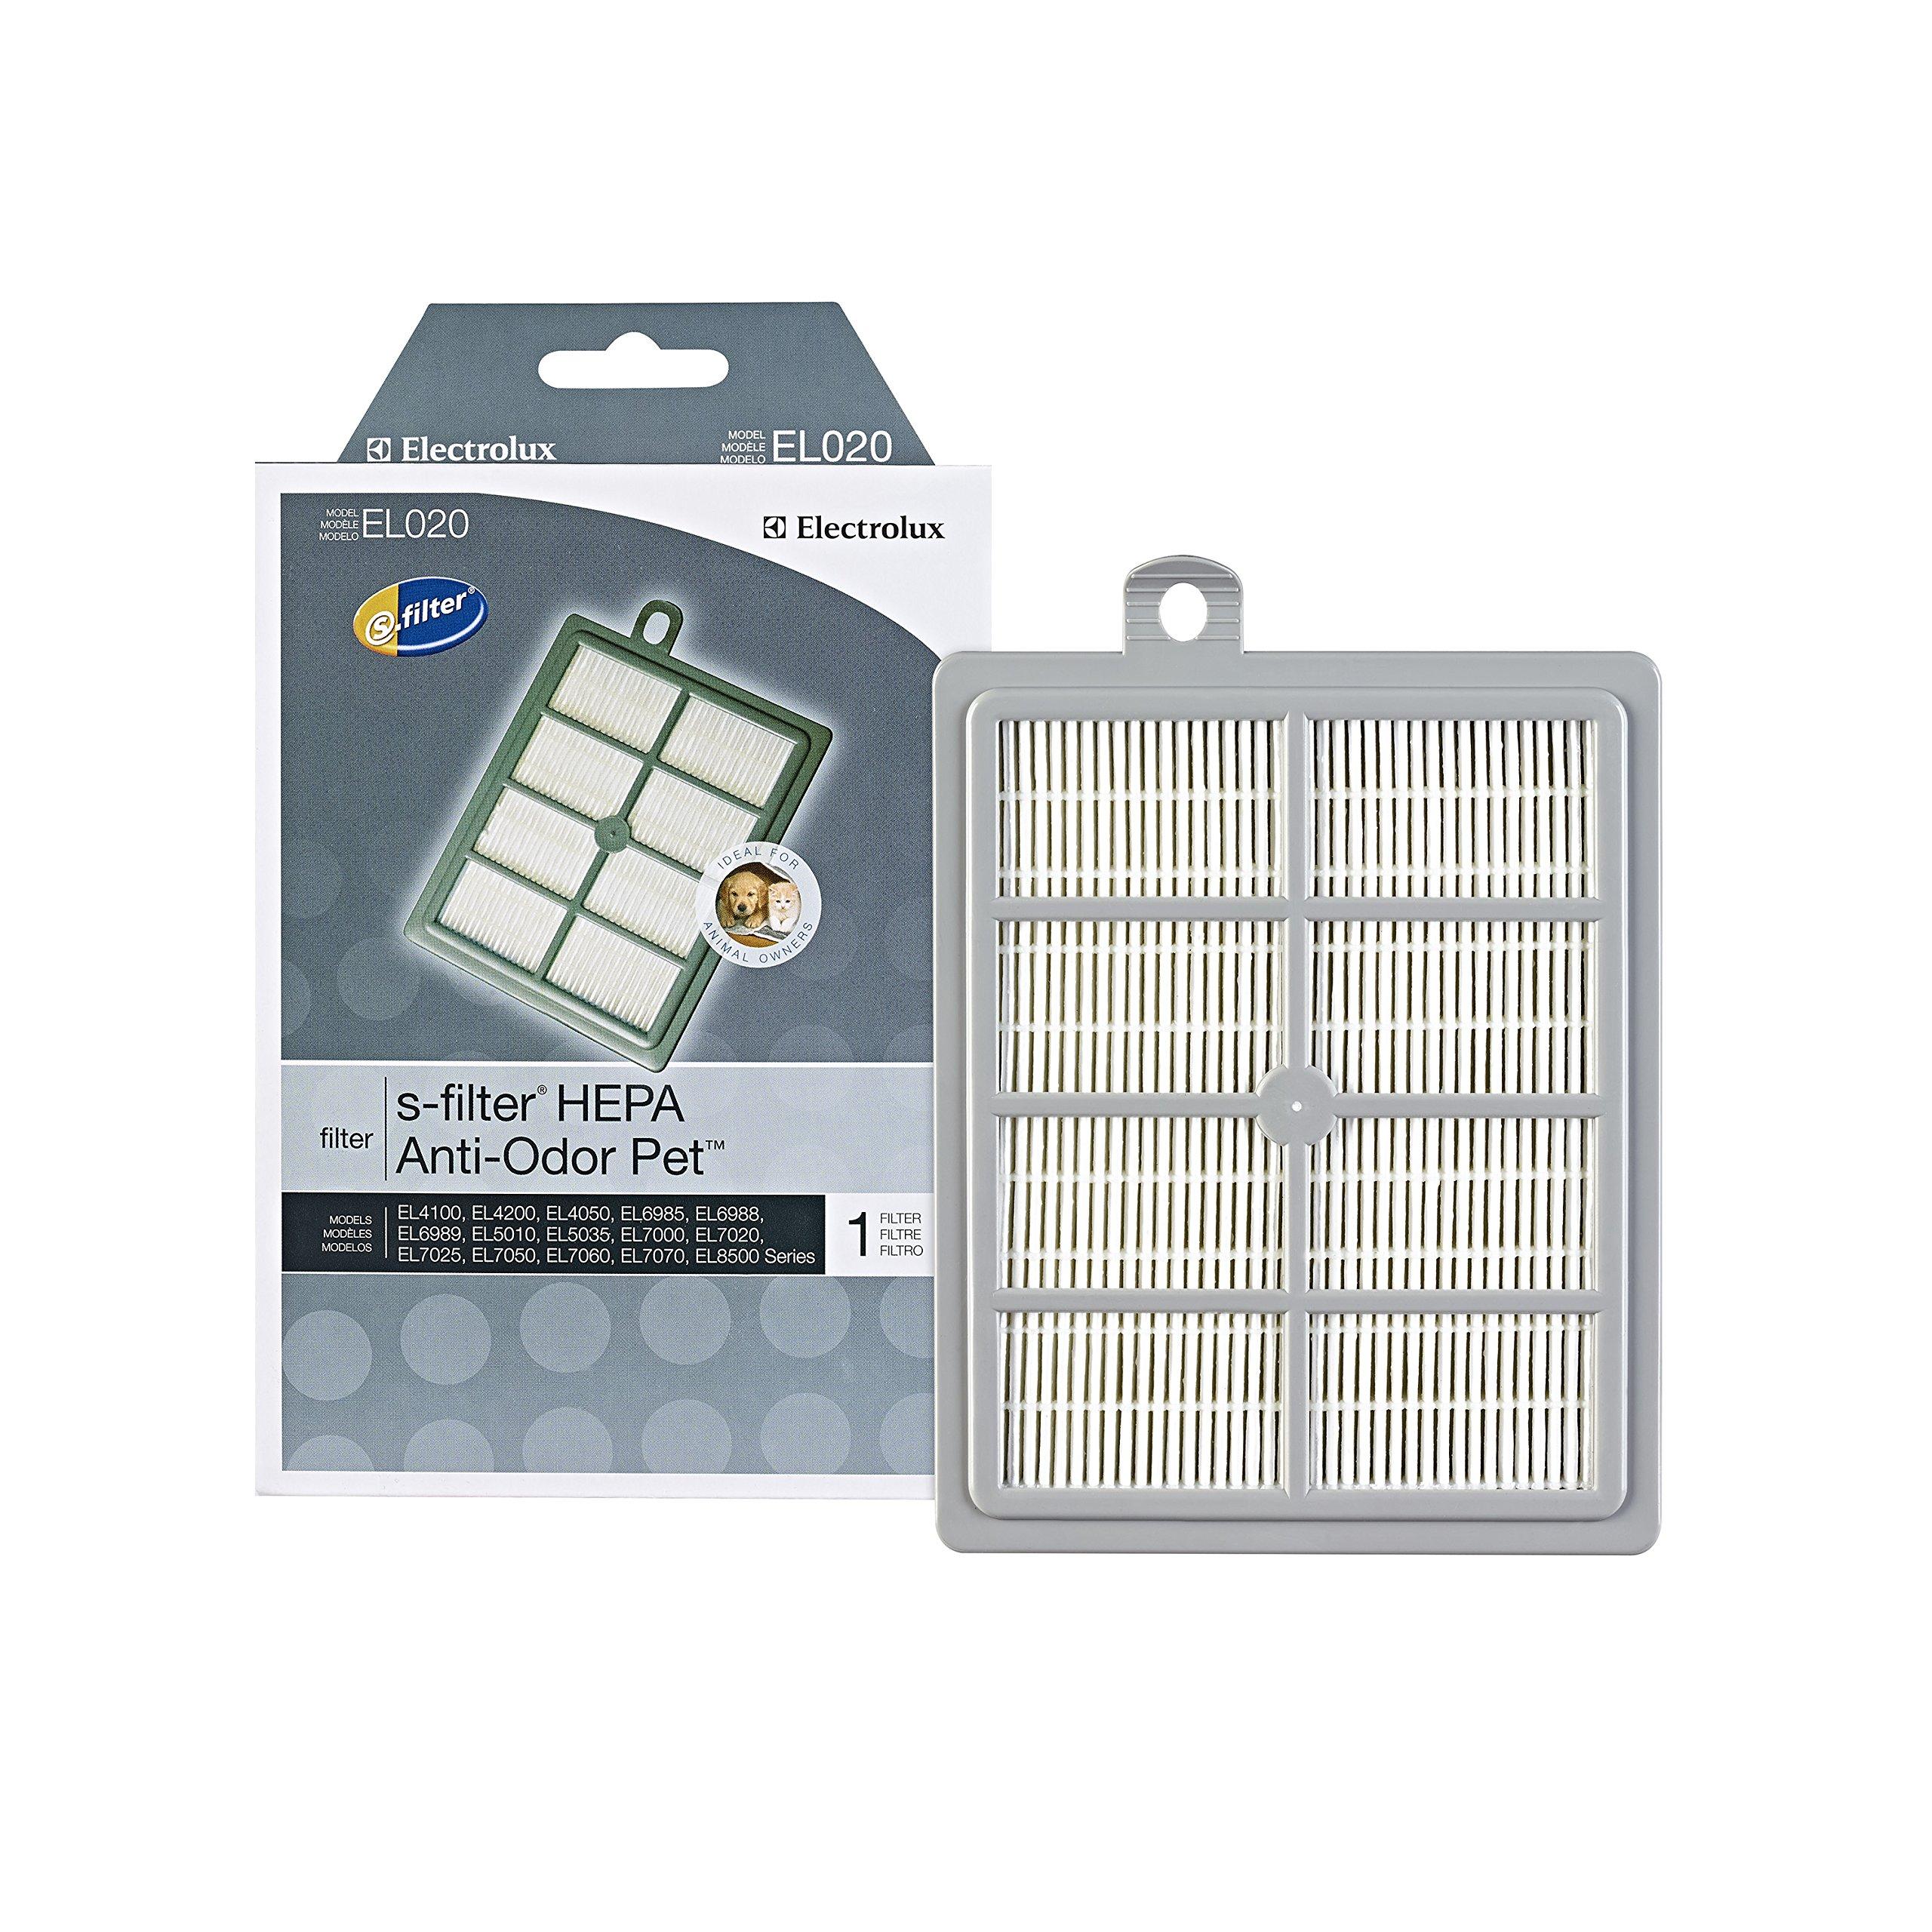 Genuine Electrolux Anti-Odor HEPA Filter EL020 by Electrolux